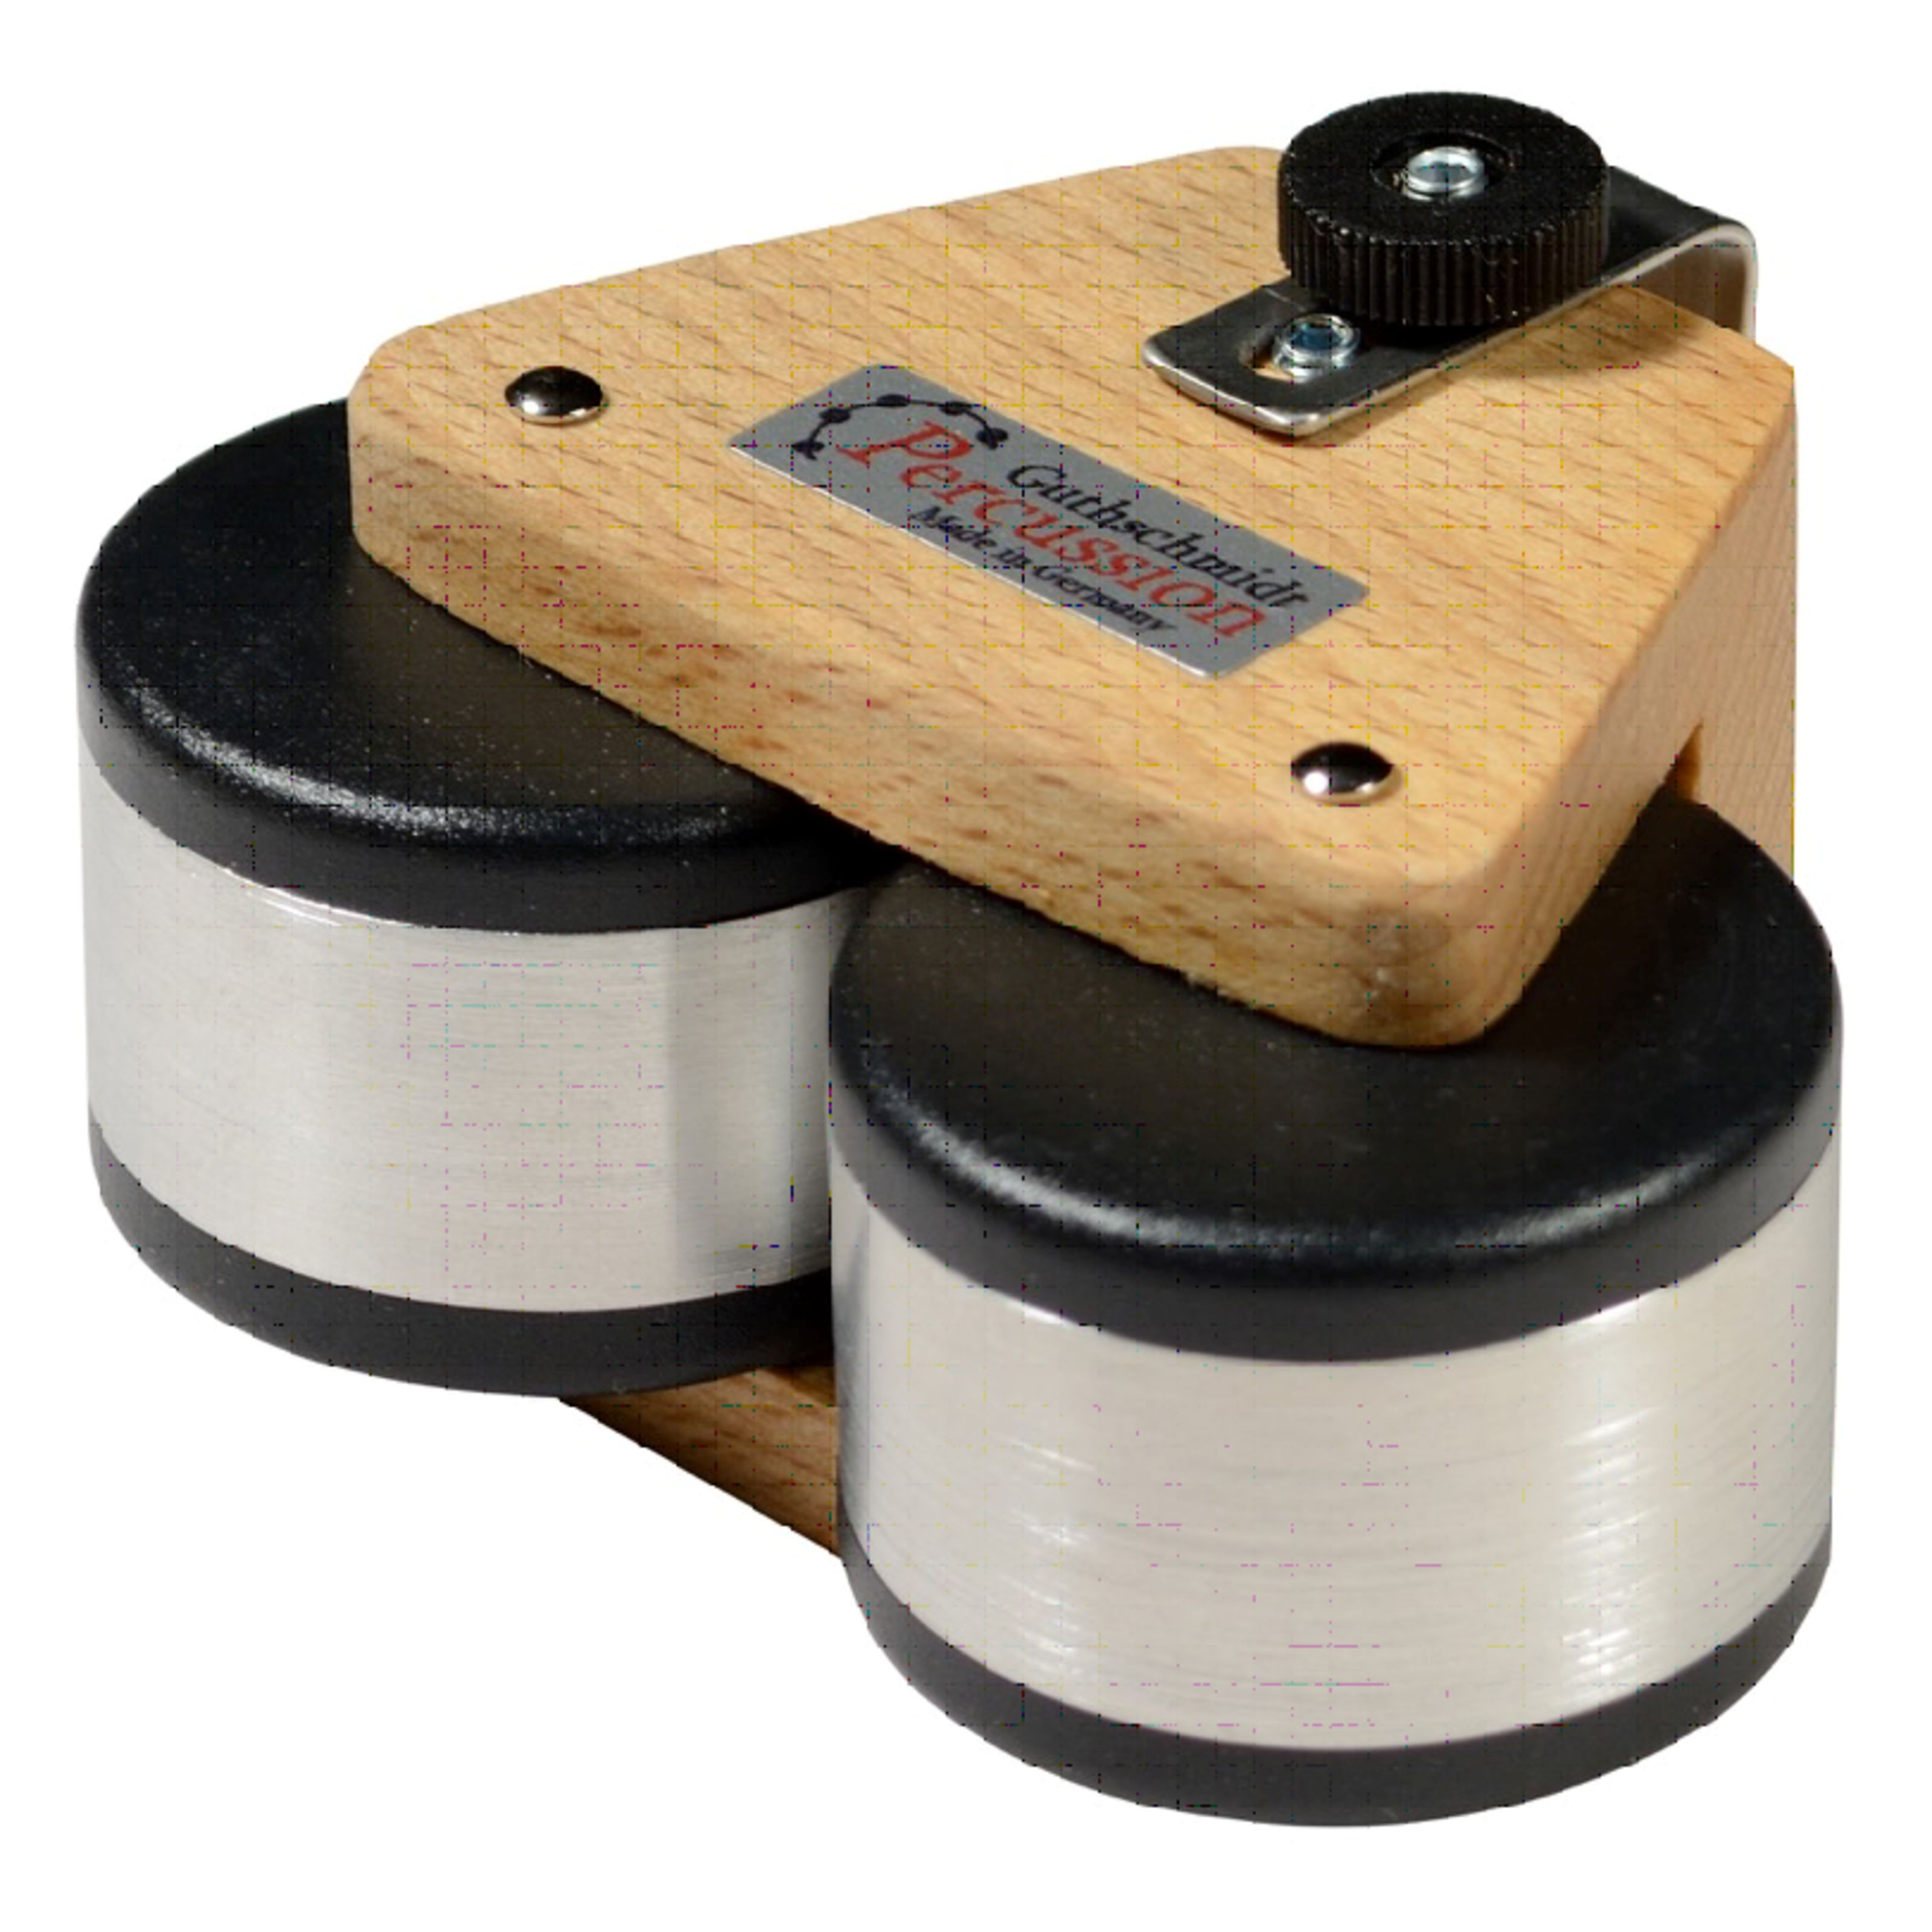 Guthschmidt Fusspercussion - Shaker Clip ShakerClip